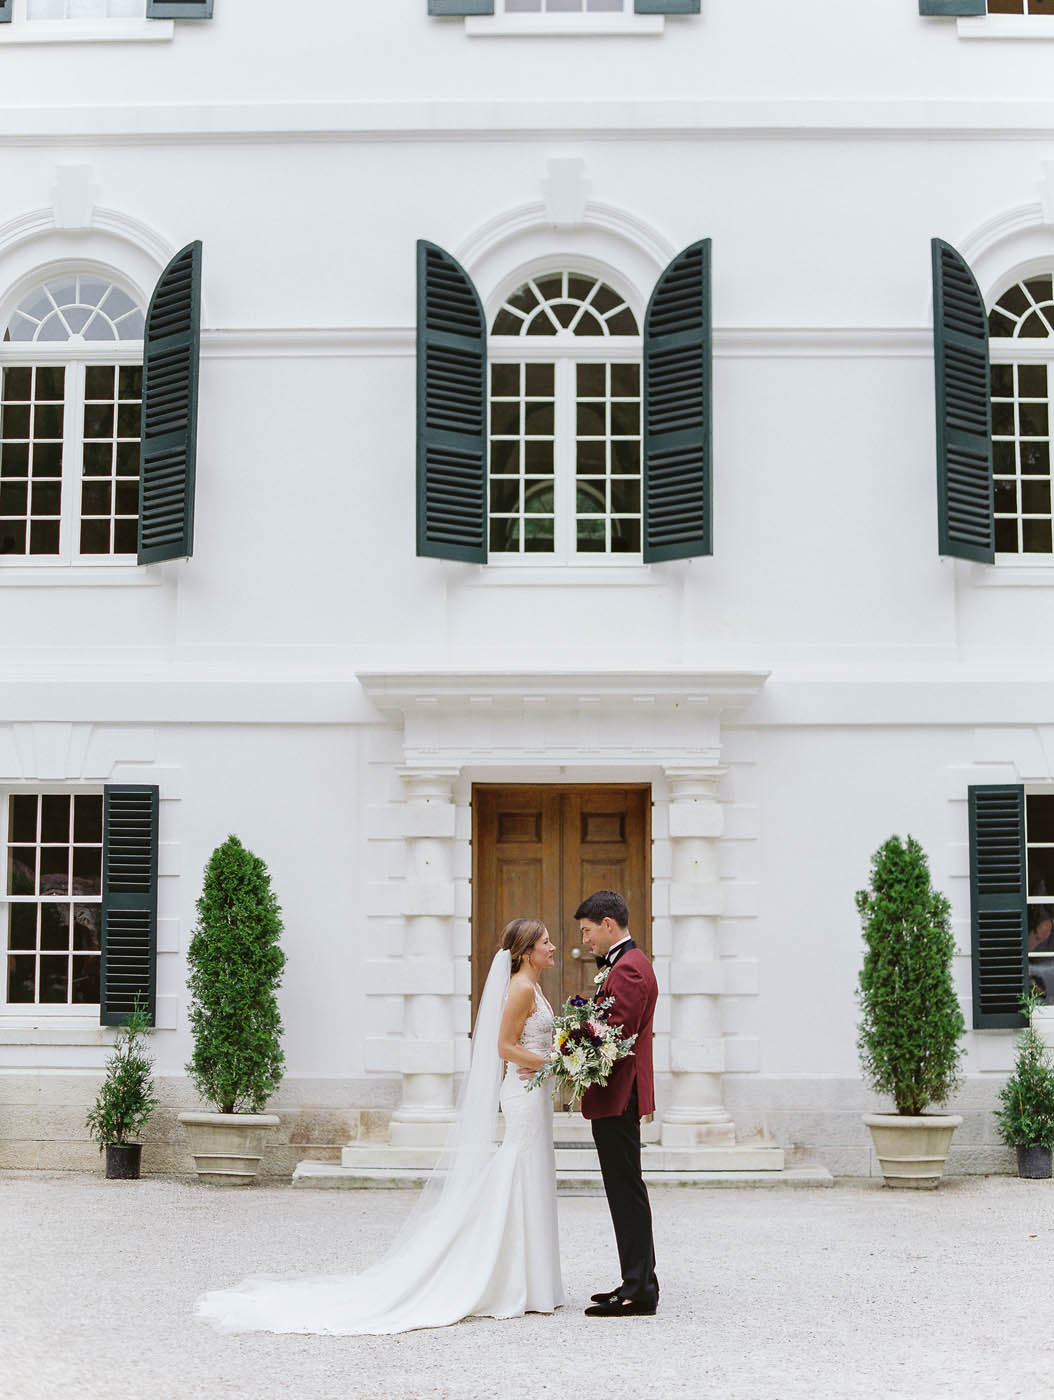 The Mount wedding venue